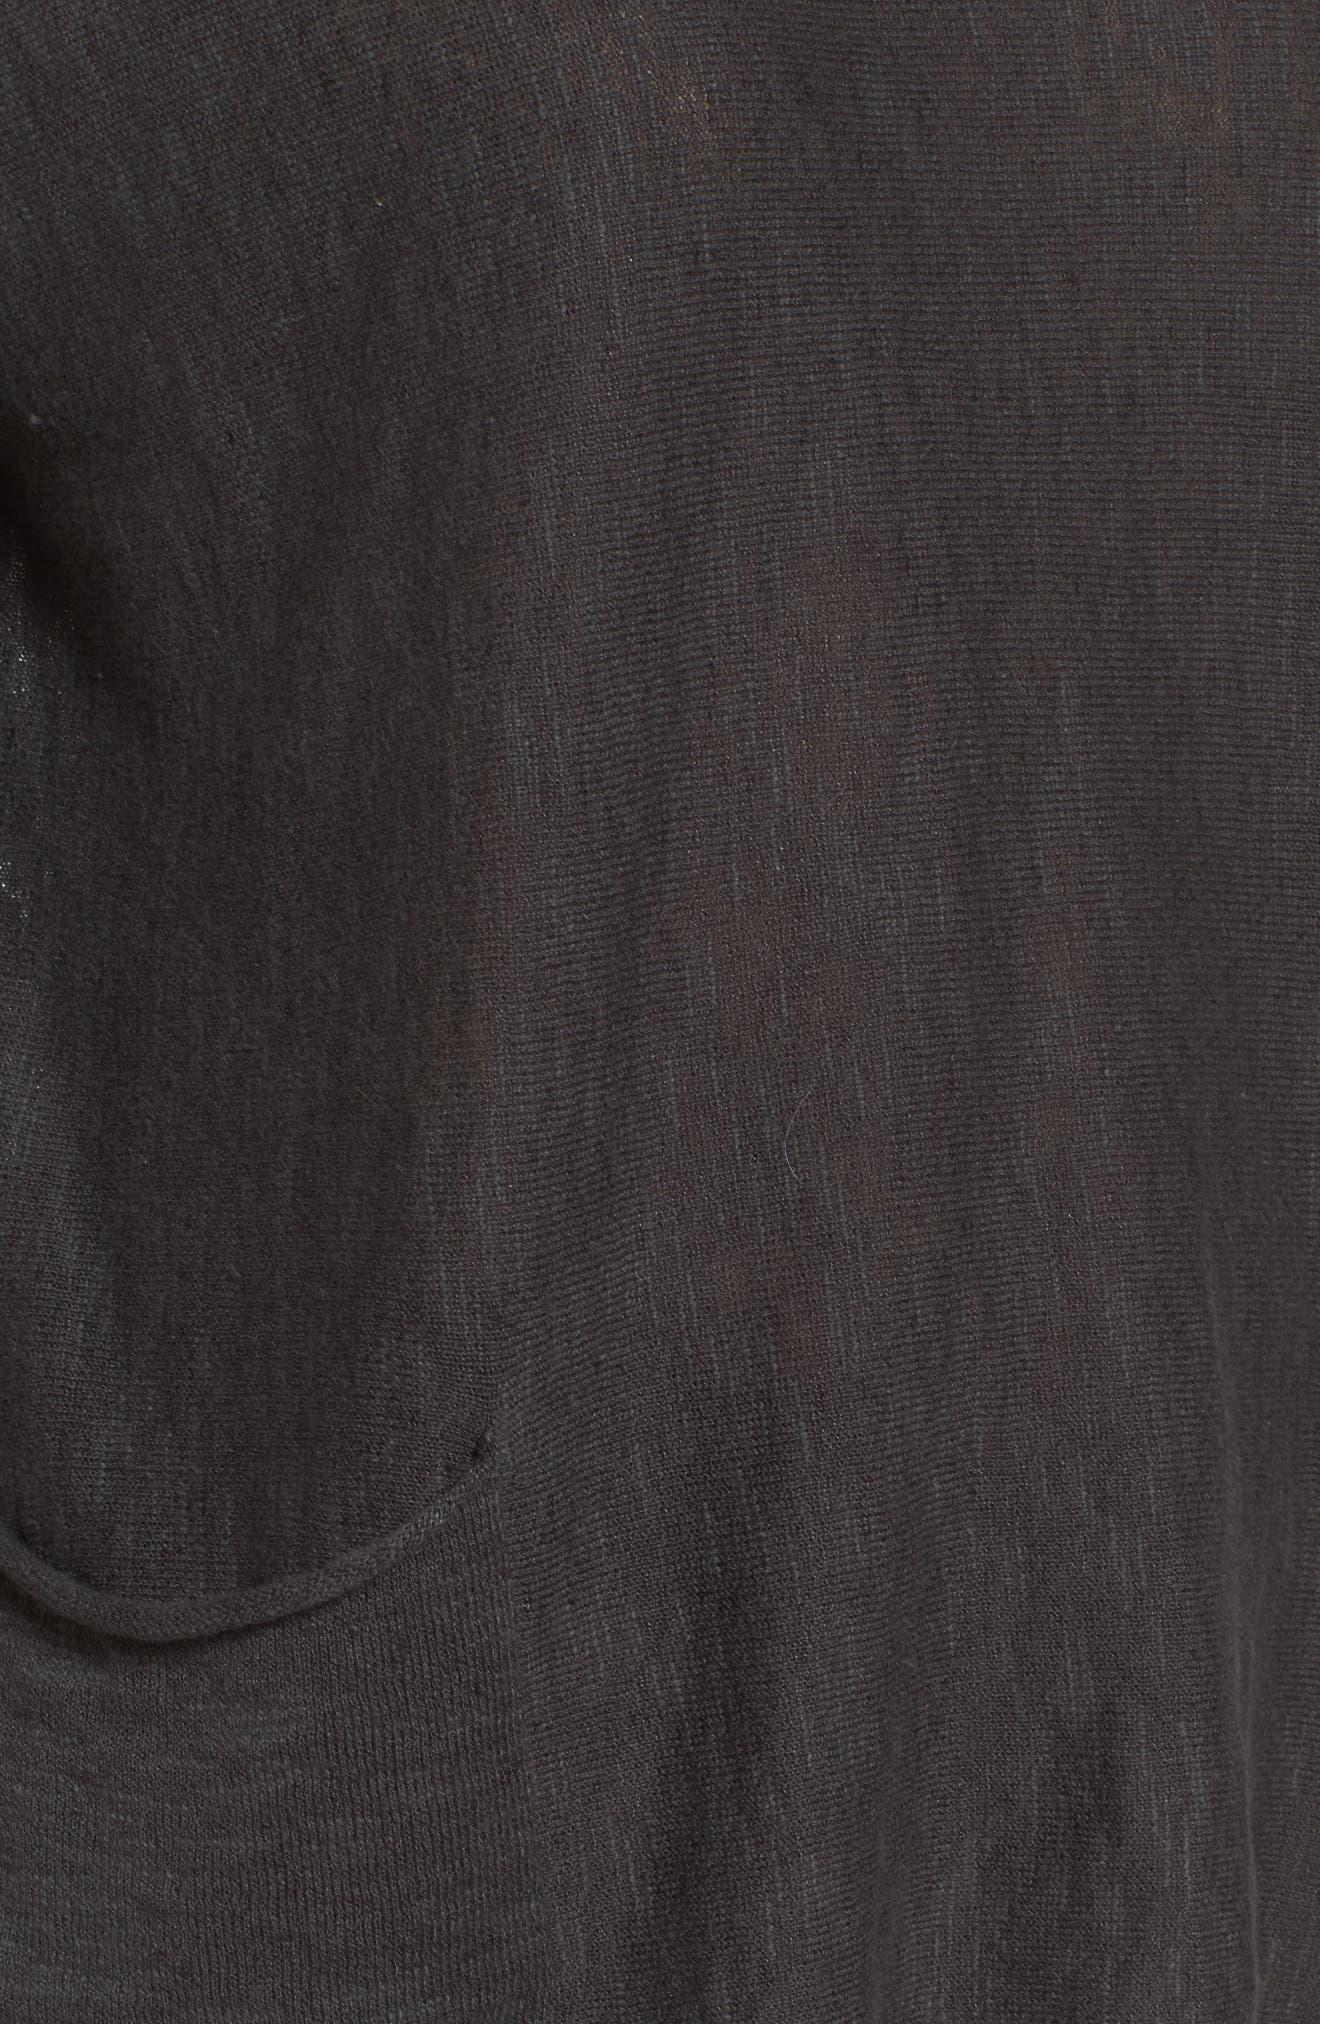 Organic Linen & Cotton Knit Boxy Top,                             Alternate thumbnail 5, color,                             021